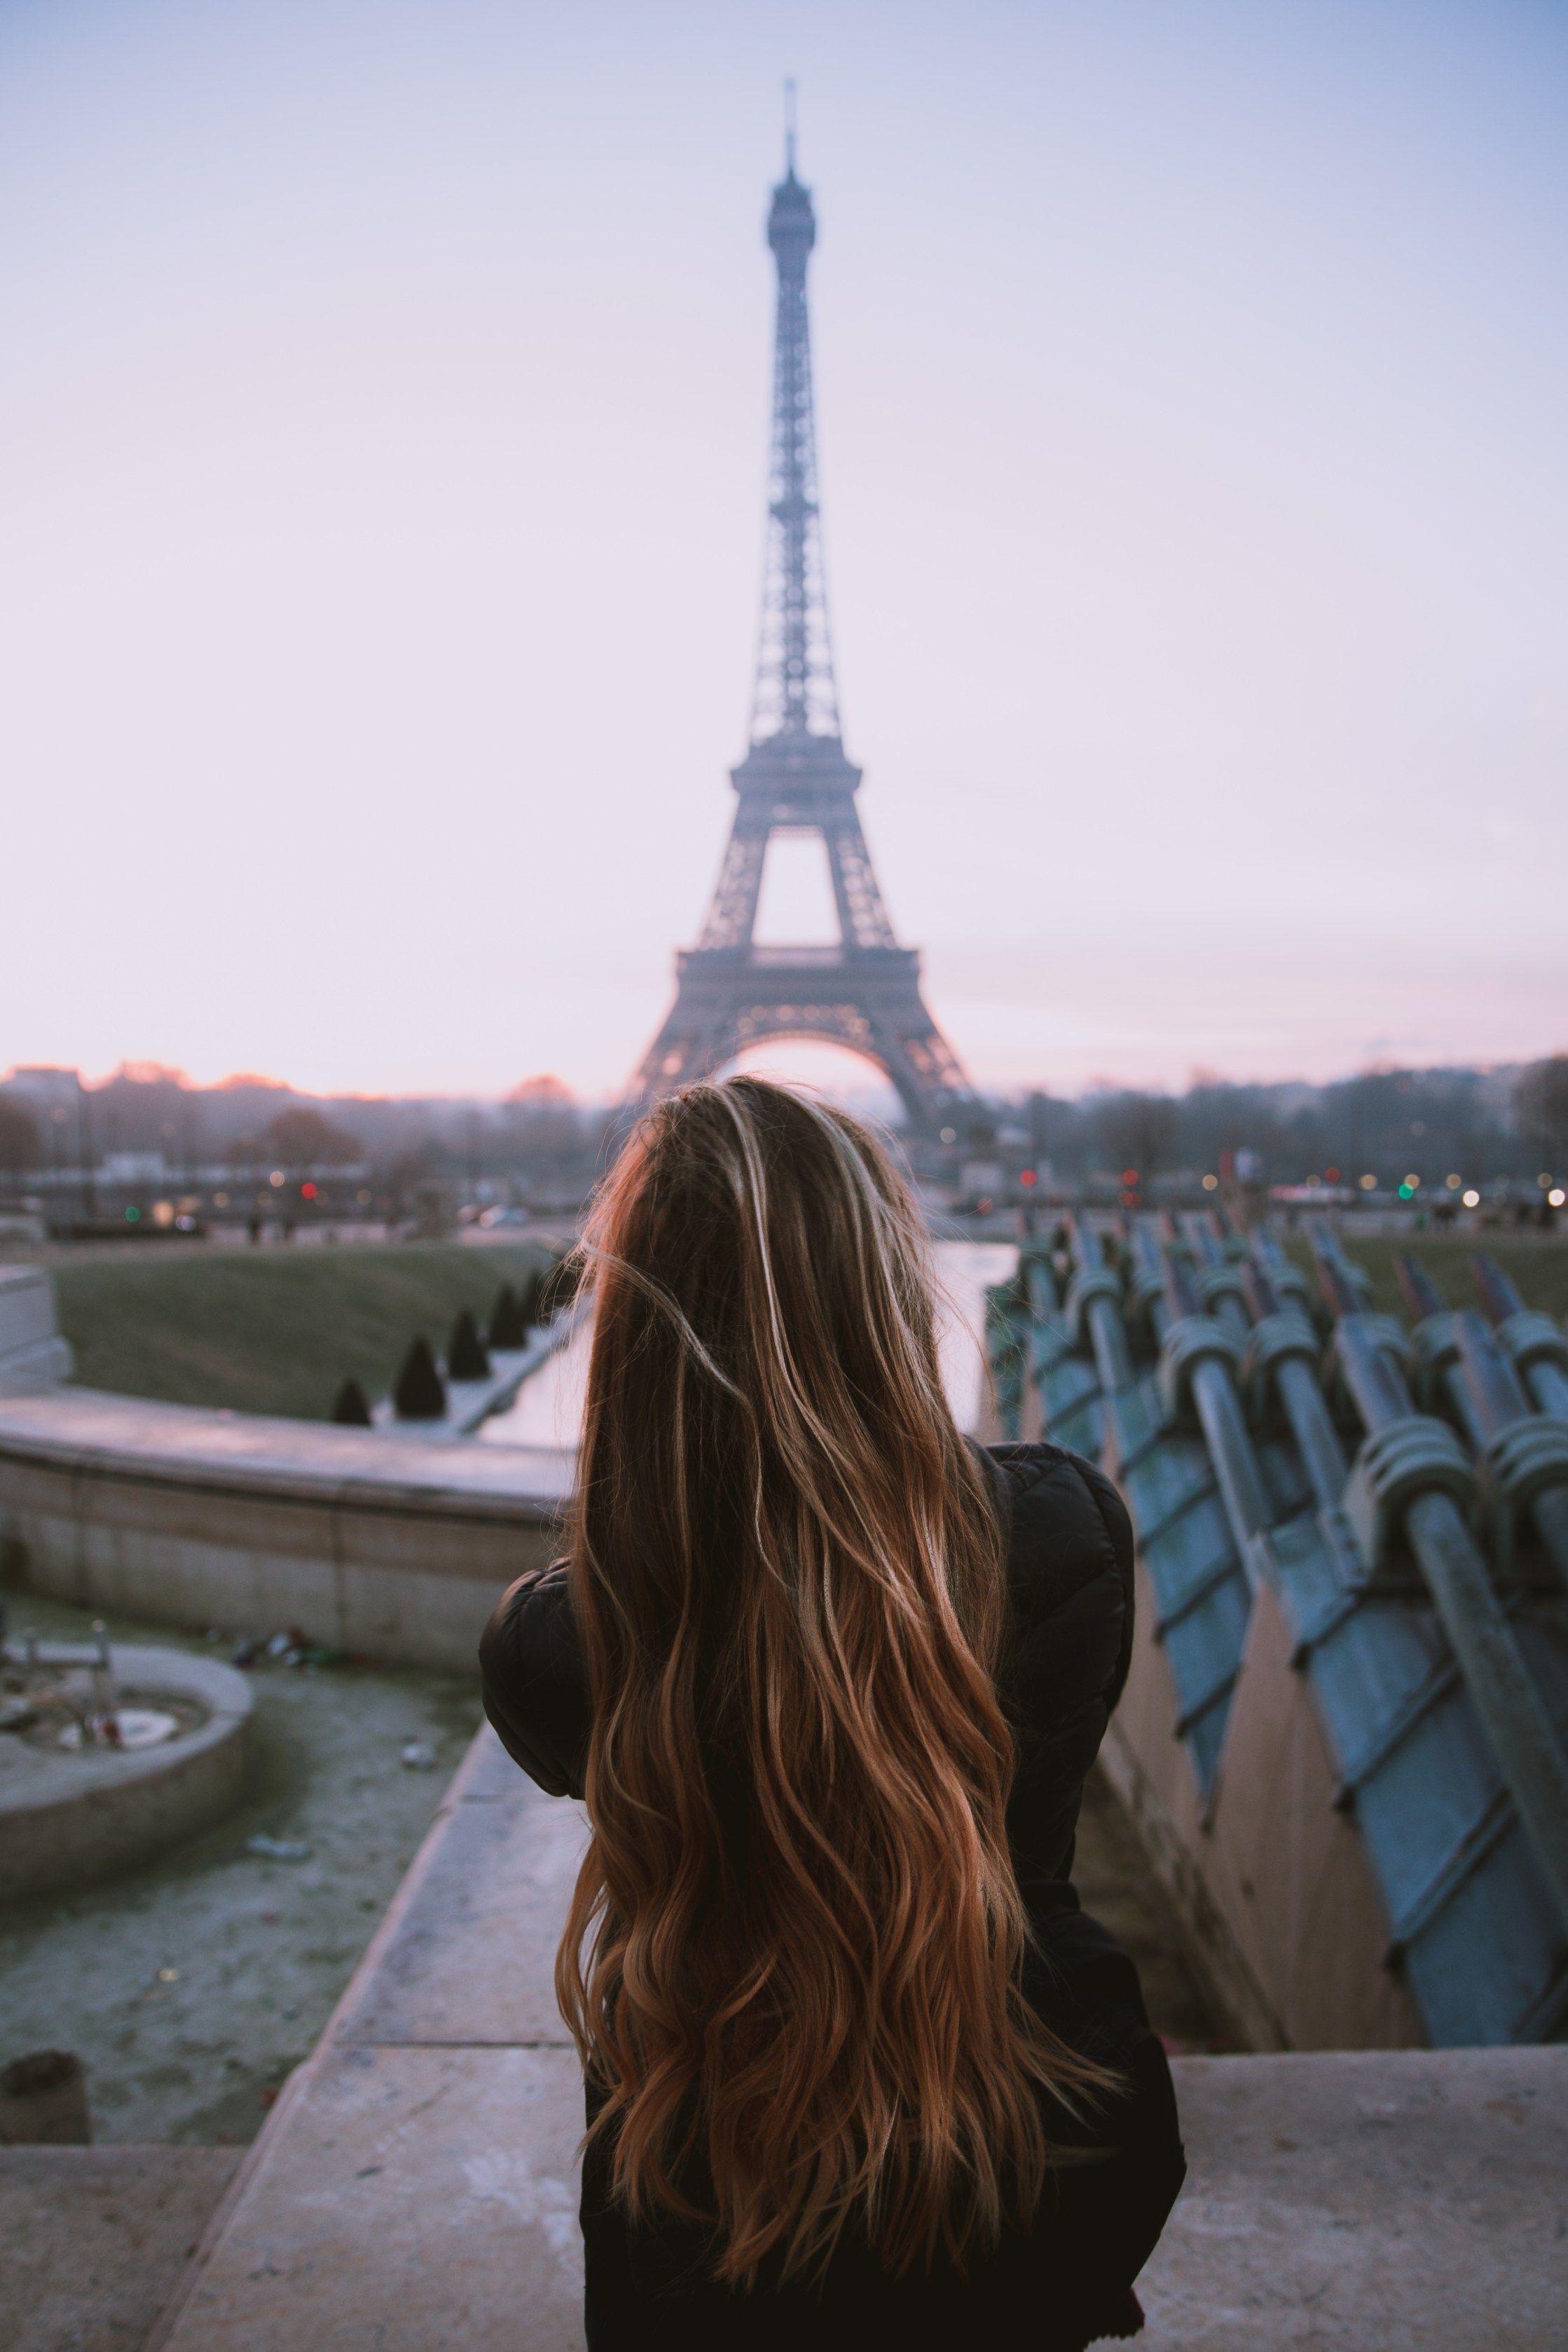 25 Best Instagram Spots In Paris Exact Photography Locations Maps And Best Times The Mandagies Paris Travel Paris Europe Photography